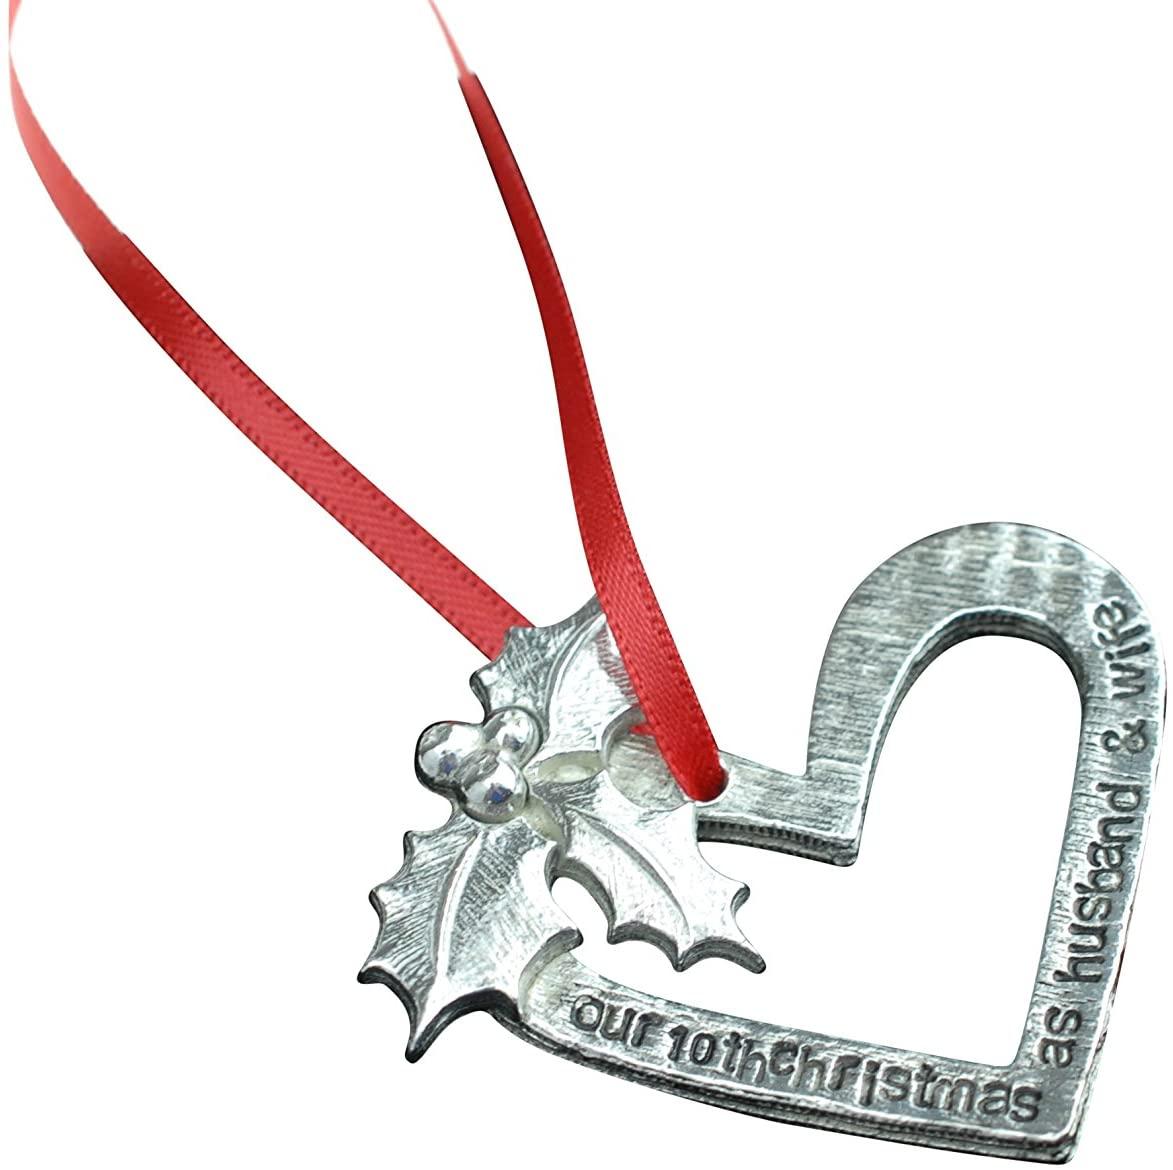 10-year-anniversary-gift-ornament